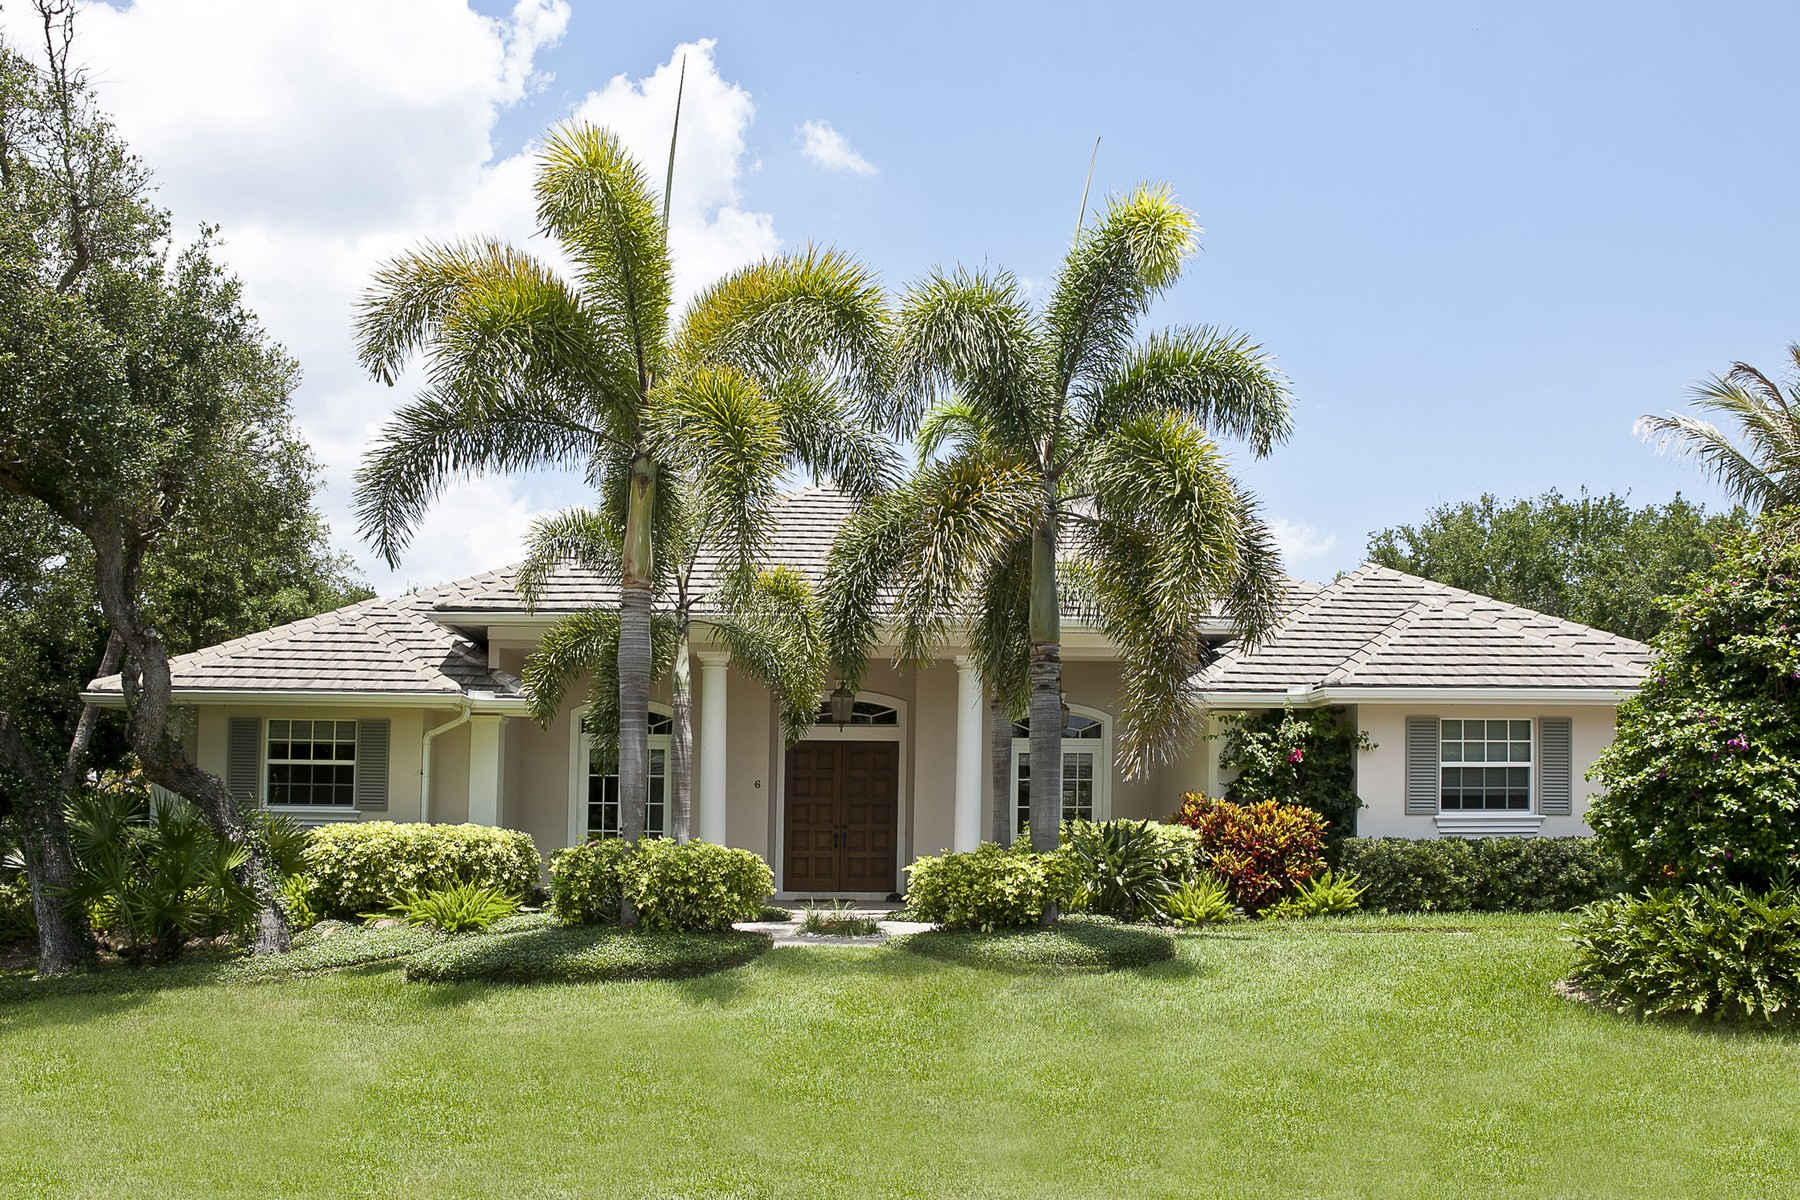 Single Family Home for Sale at Amazing Custom home in Sea Colony 6 W Sea Colony Drive Vero Beach, Florida 32963 United States